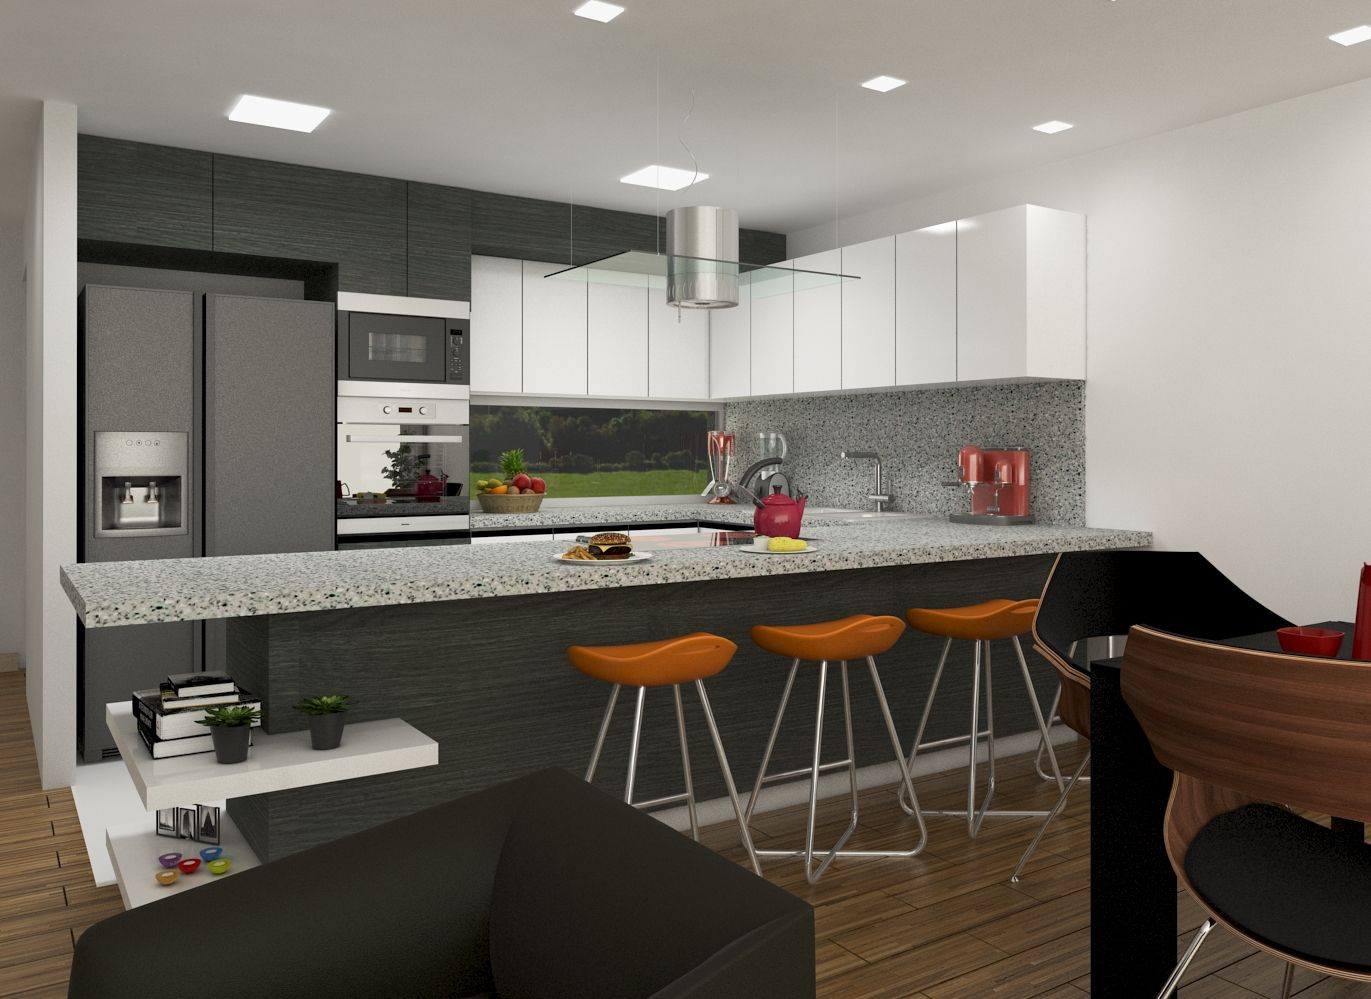 Diseño interior moderno contemporaneo cocina | Diseño Interior ...